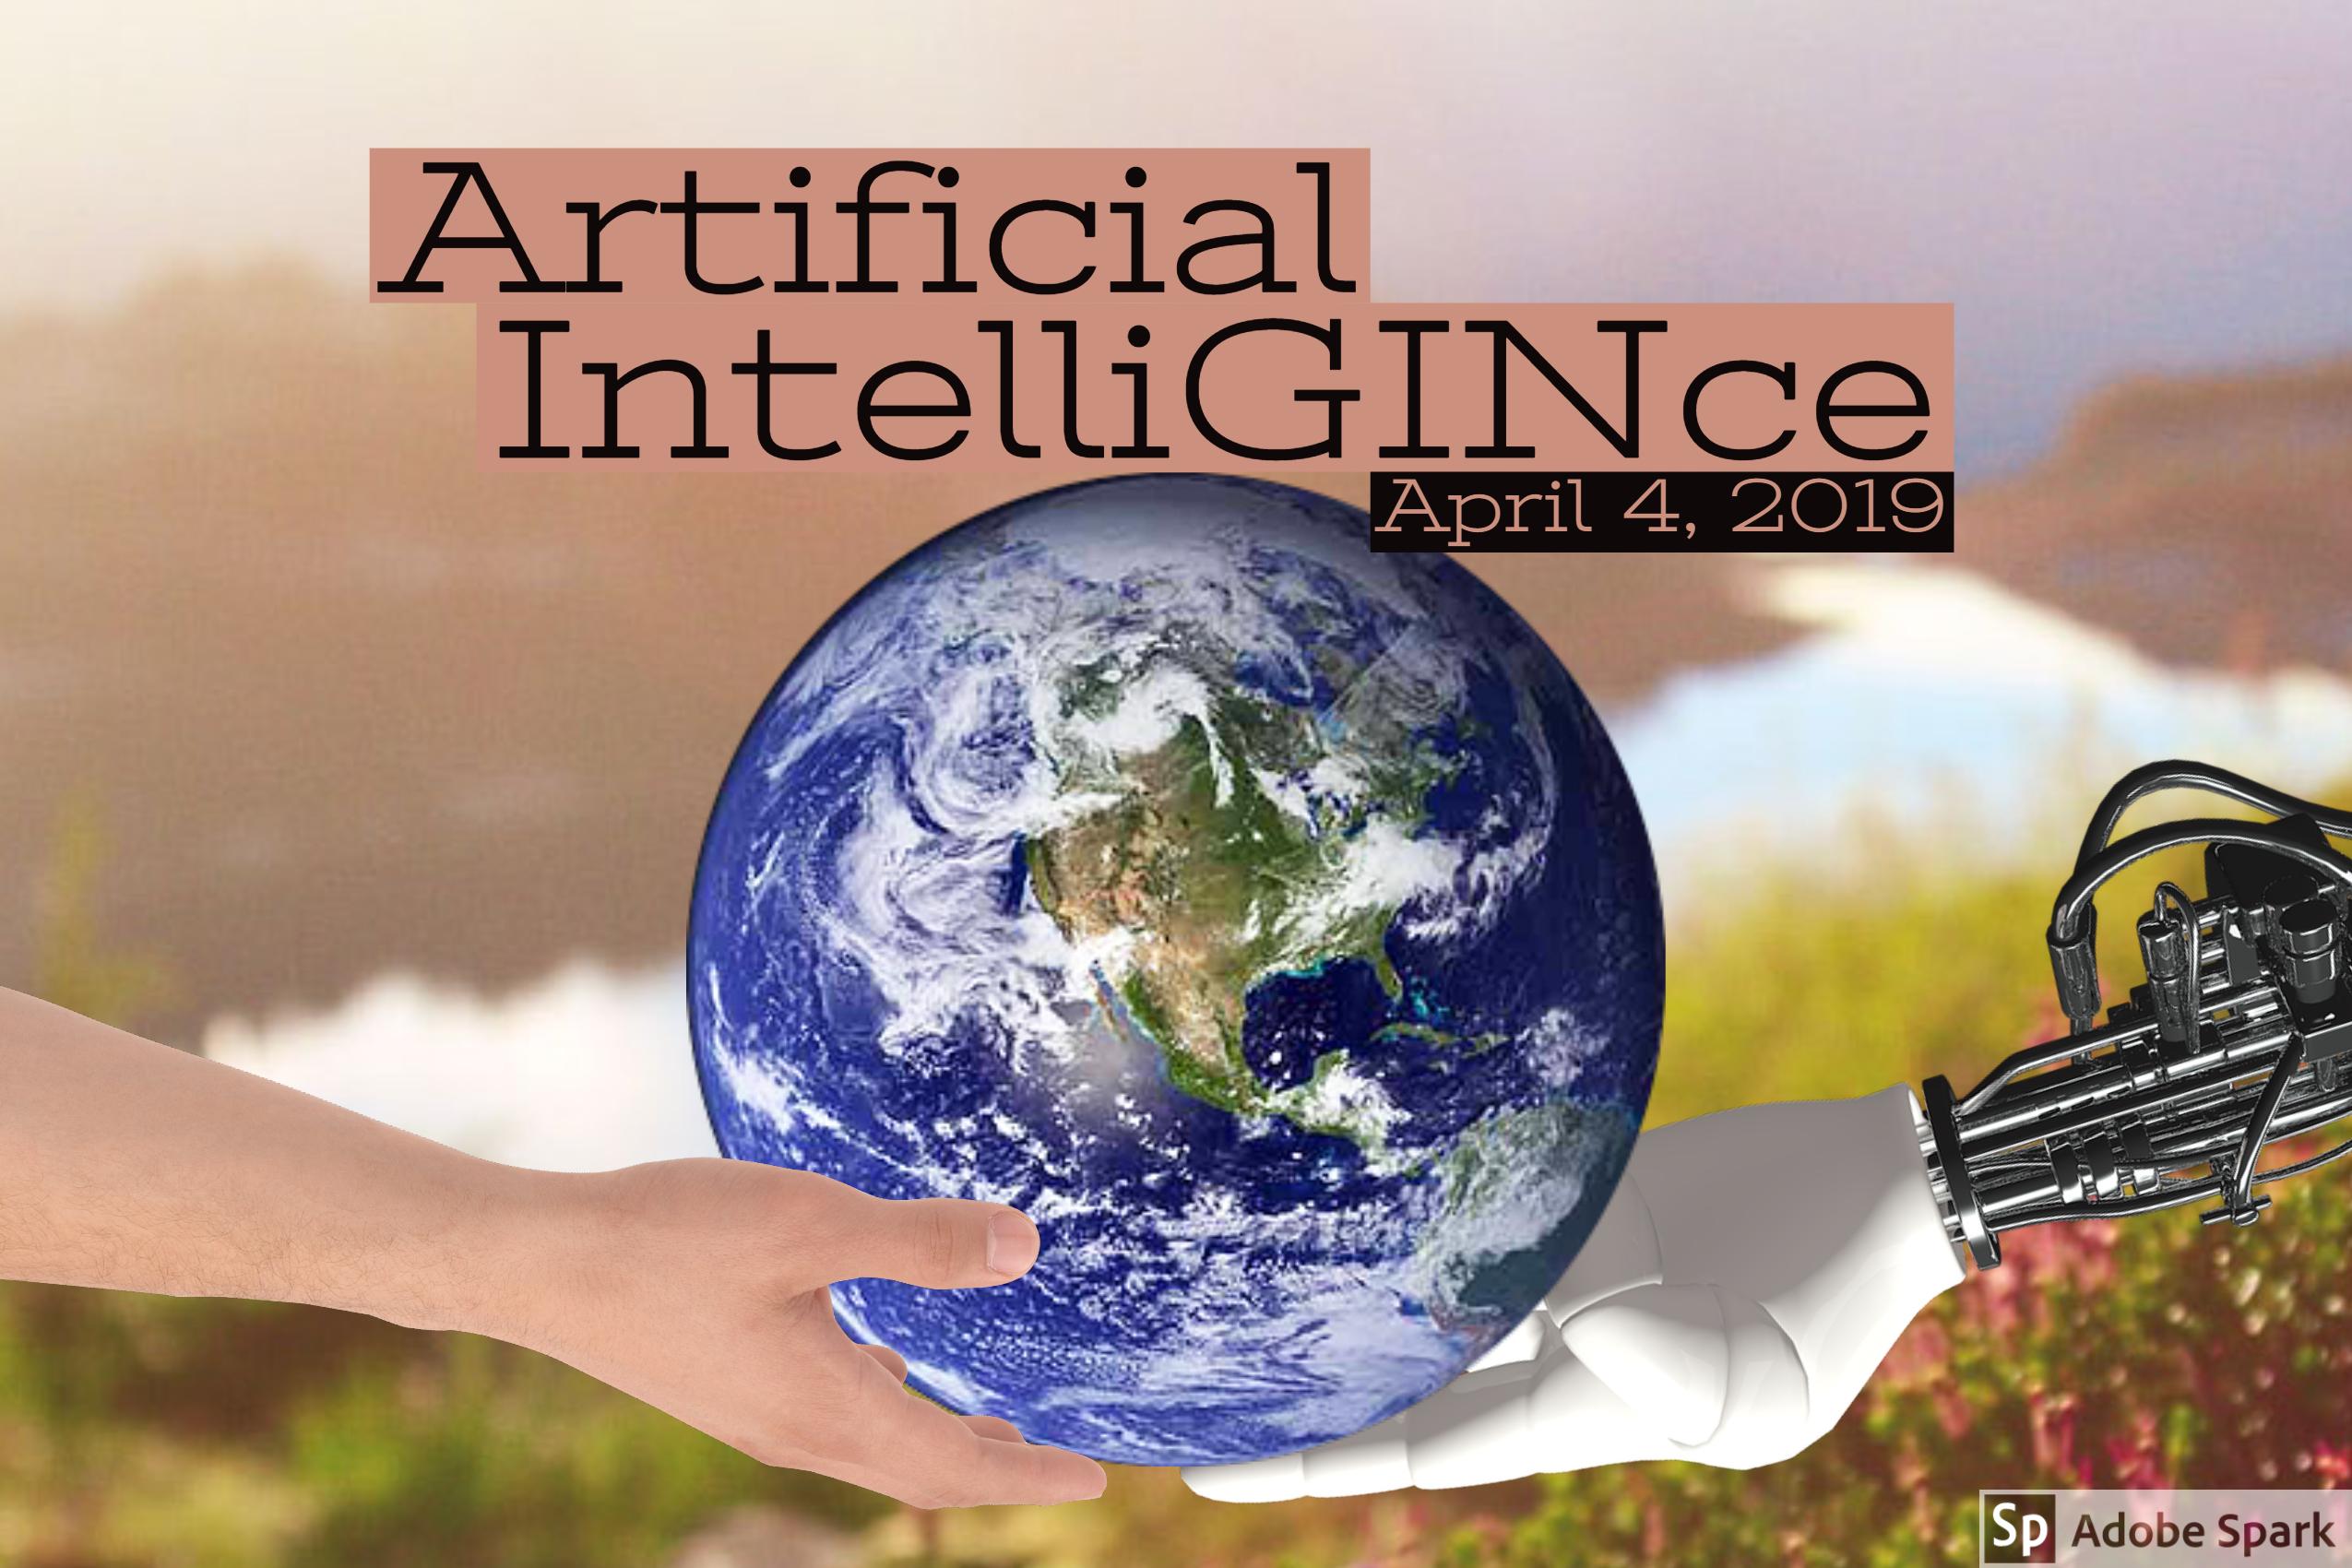 Artificial IntelliGINce